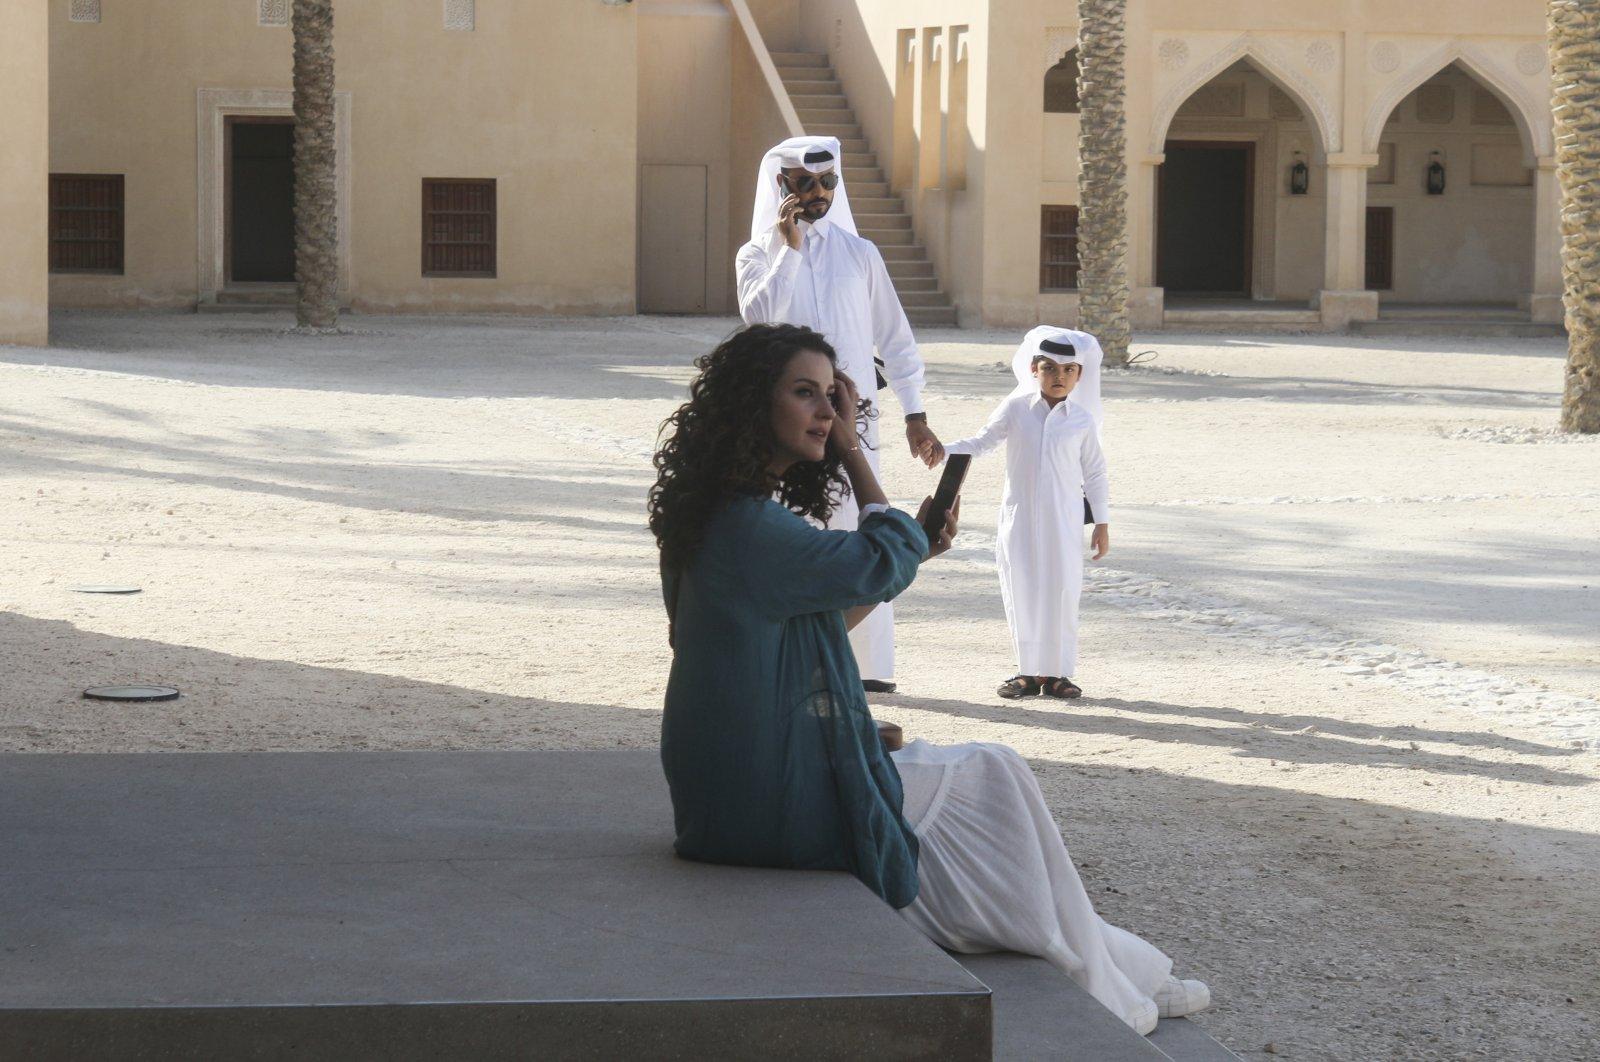 Turkish actress İrem Helvacıoğlu acts in a new Turkish series in Qatar, Doha, Dec. 17, 2020. (AA Photo)